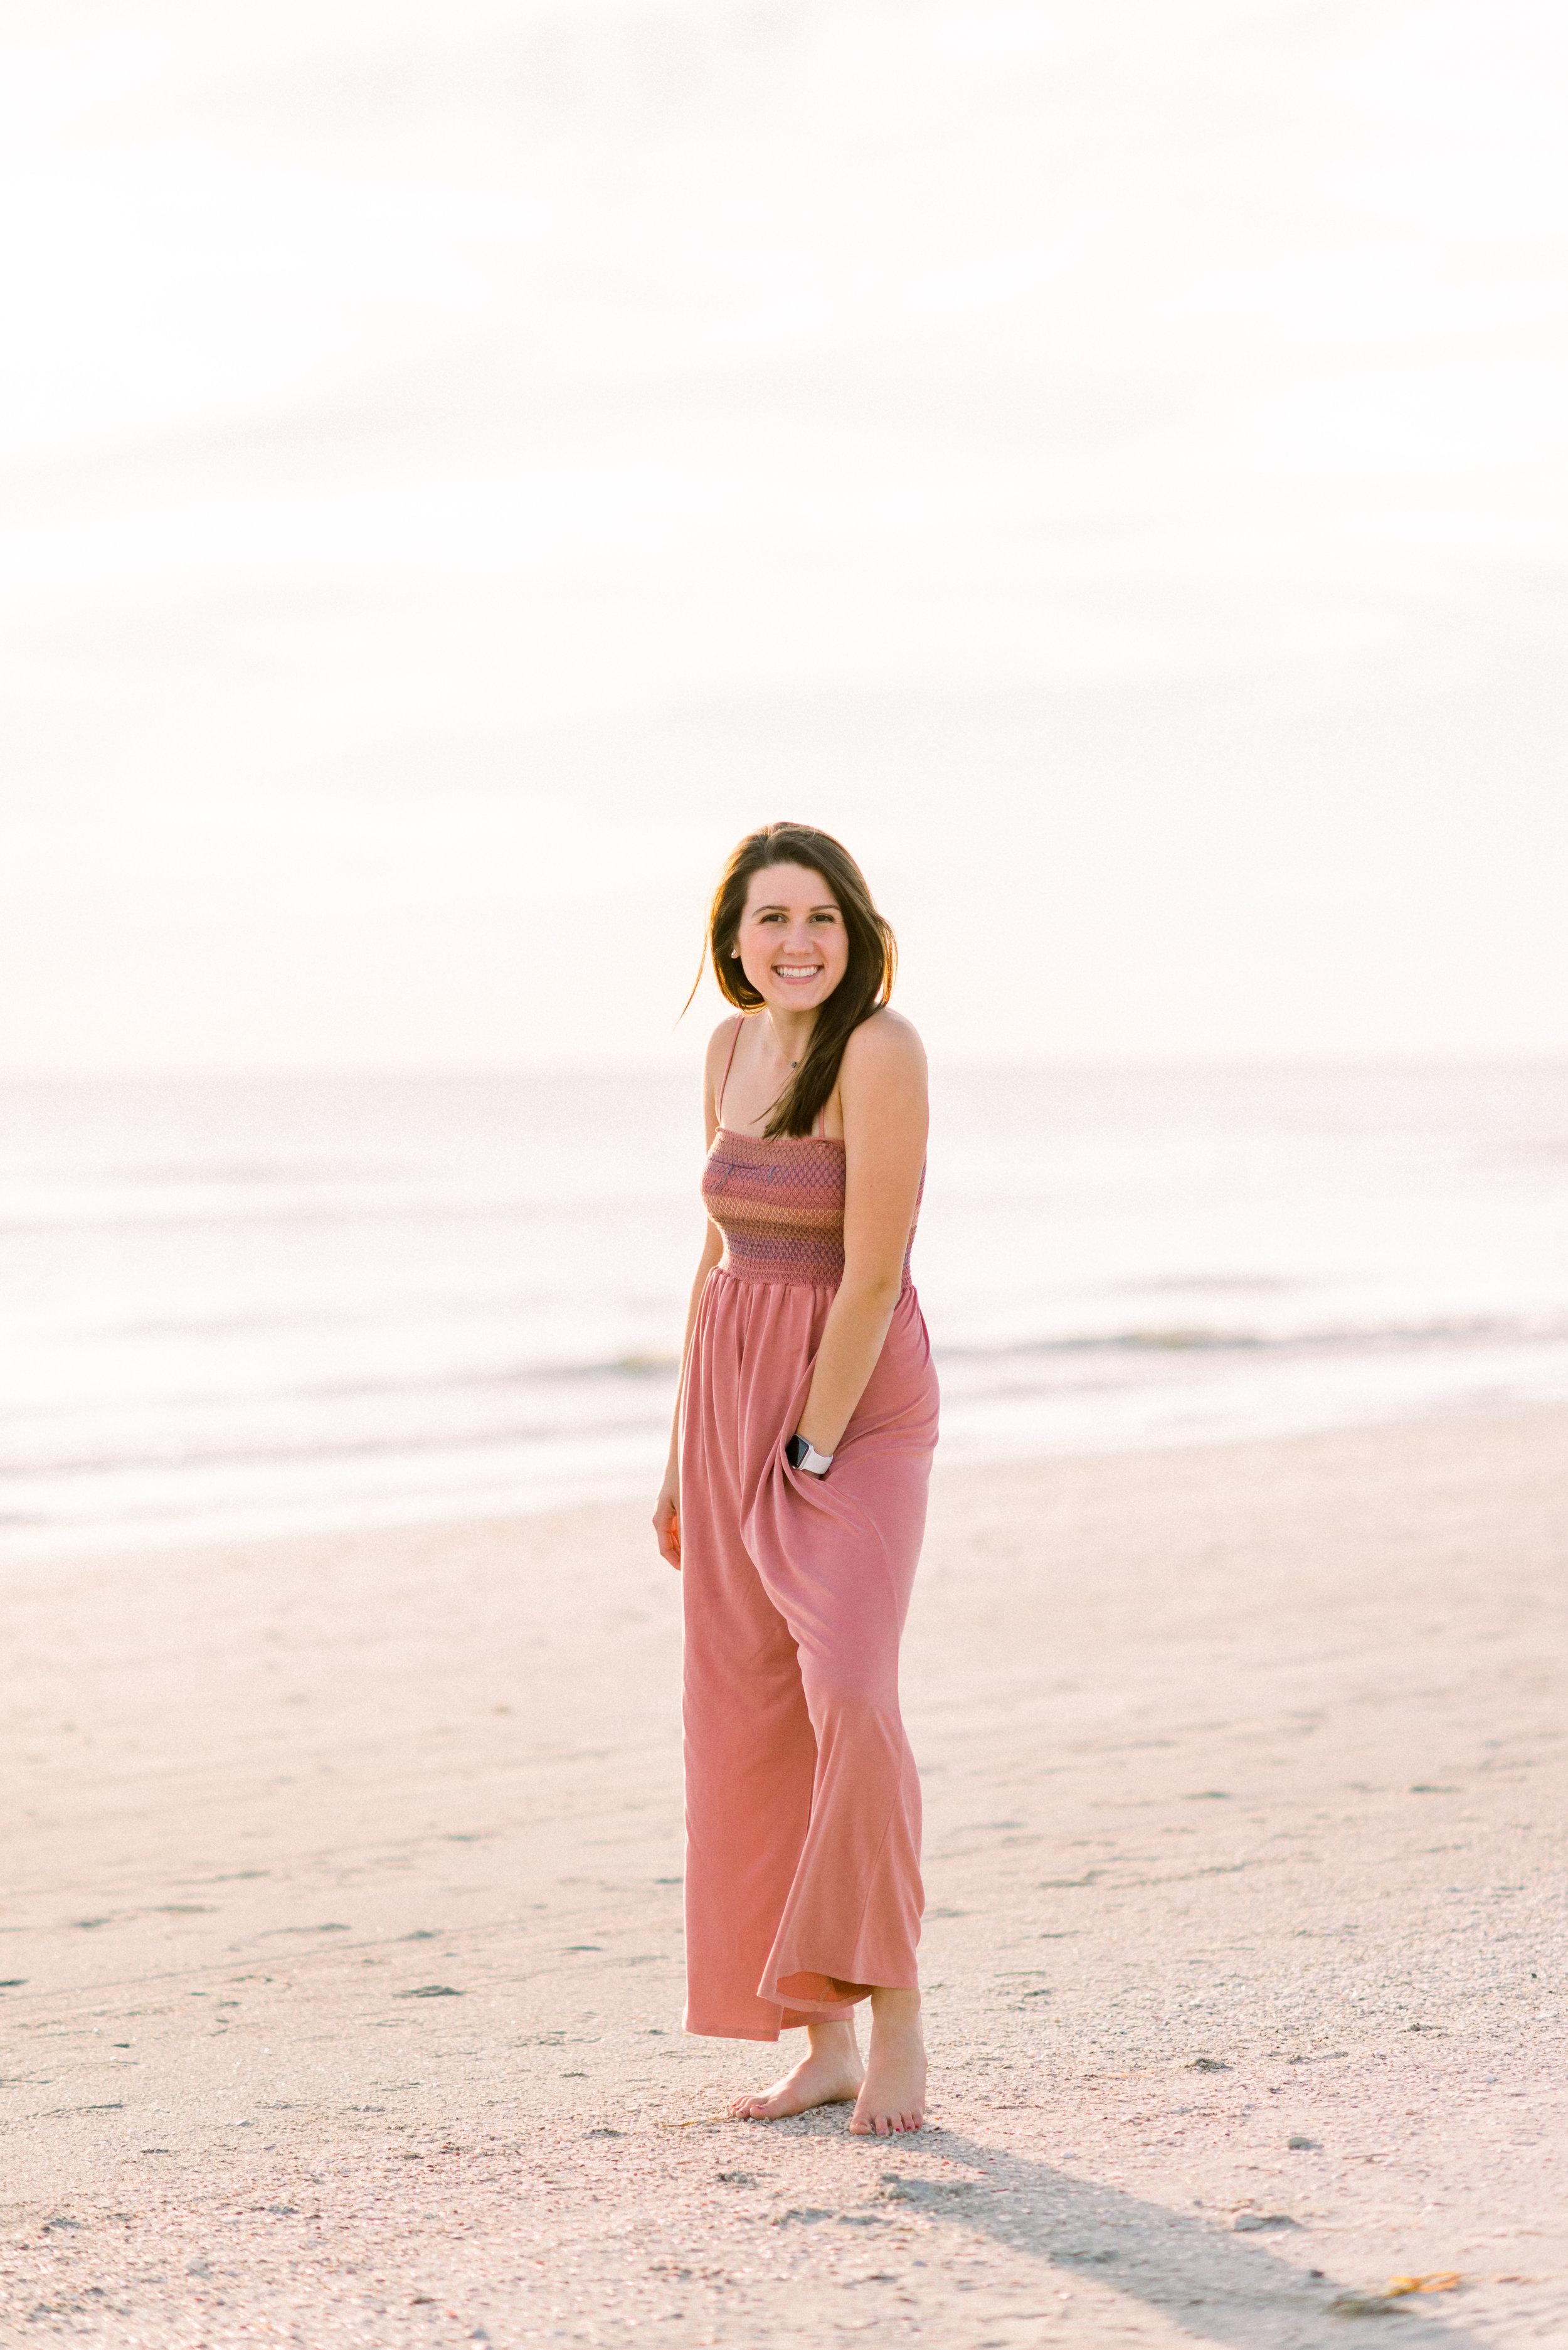 KateTaramykinStudios-Tampa-Senior-Portraits-Cameron-19.jpg